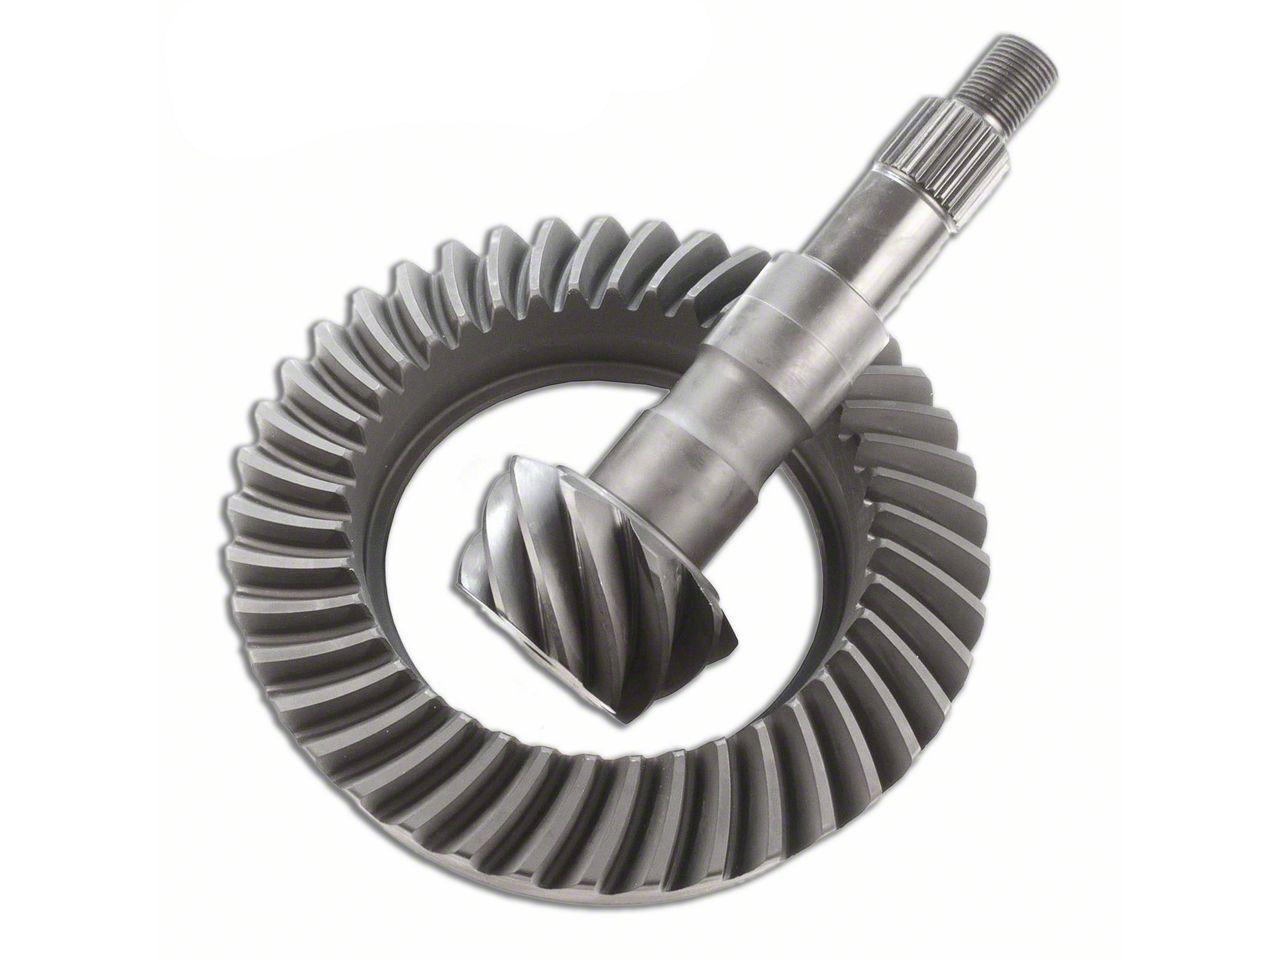 Motive Performance 8.5 in. & 8.6 in. Rear Axle Ring Gear and Pinion Kit - 4.10 Gears (07-18 Silverado 1500)